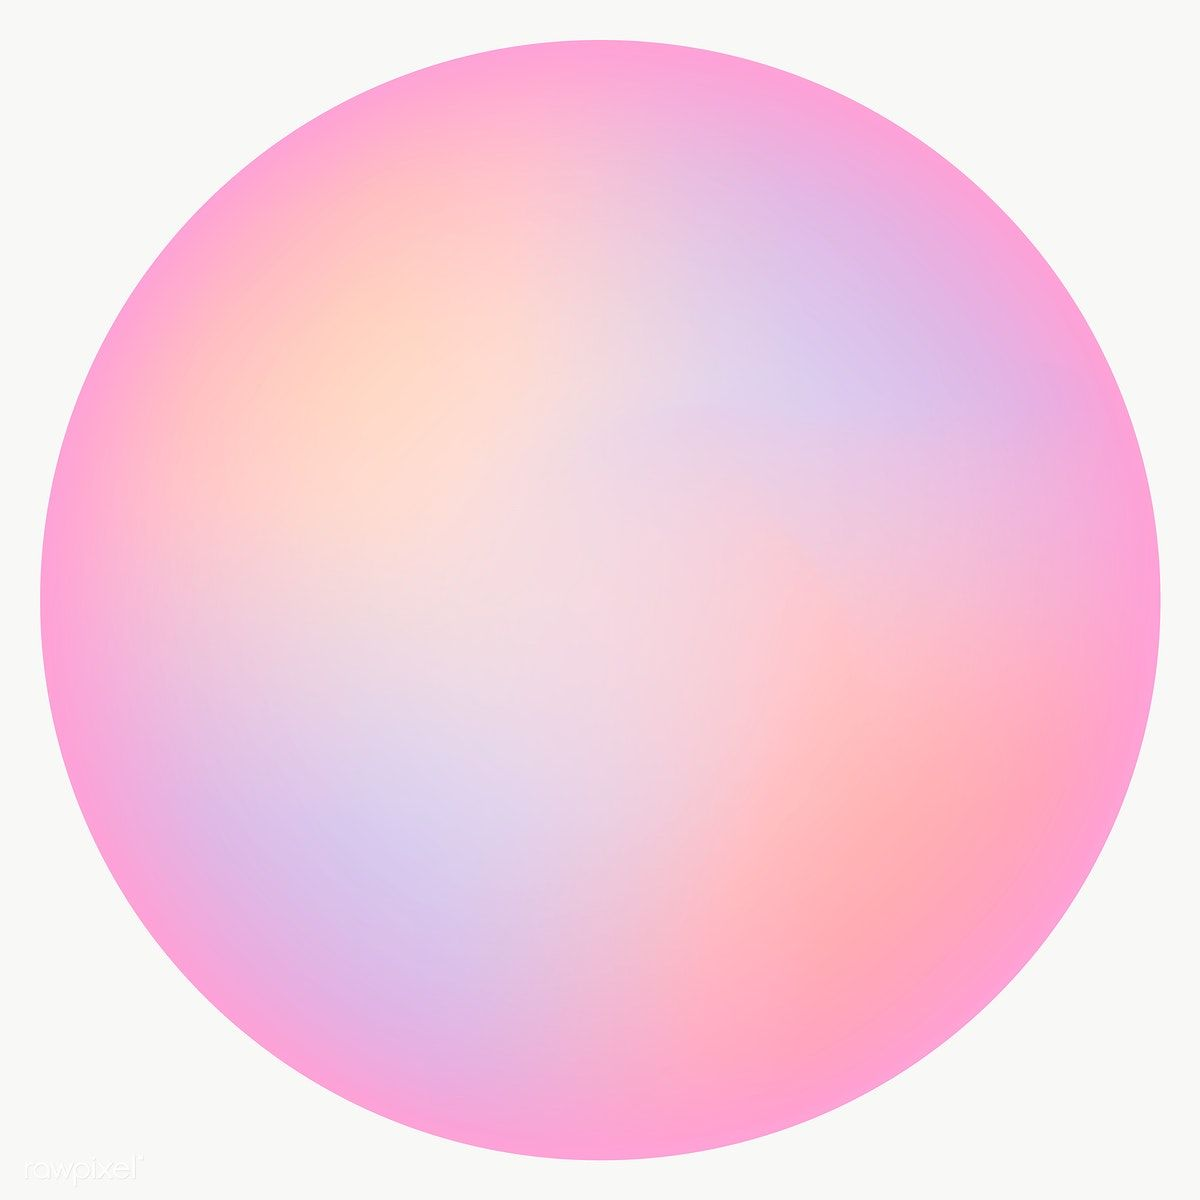 Download Premium Illustration Of Colorful Round Gradient Element Gradient Color Design Design Resources Free Design Resources